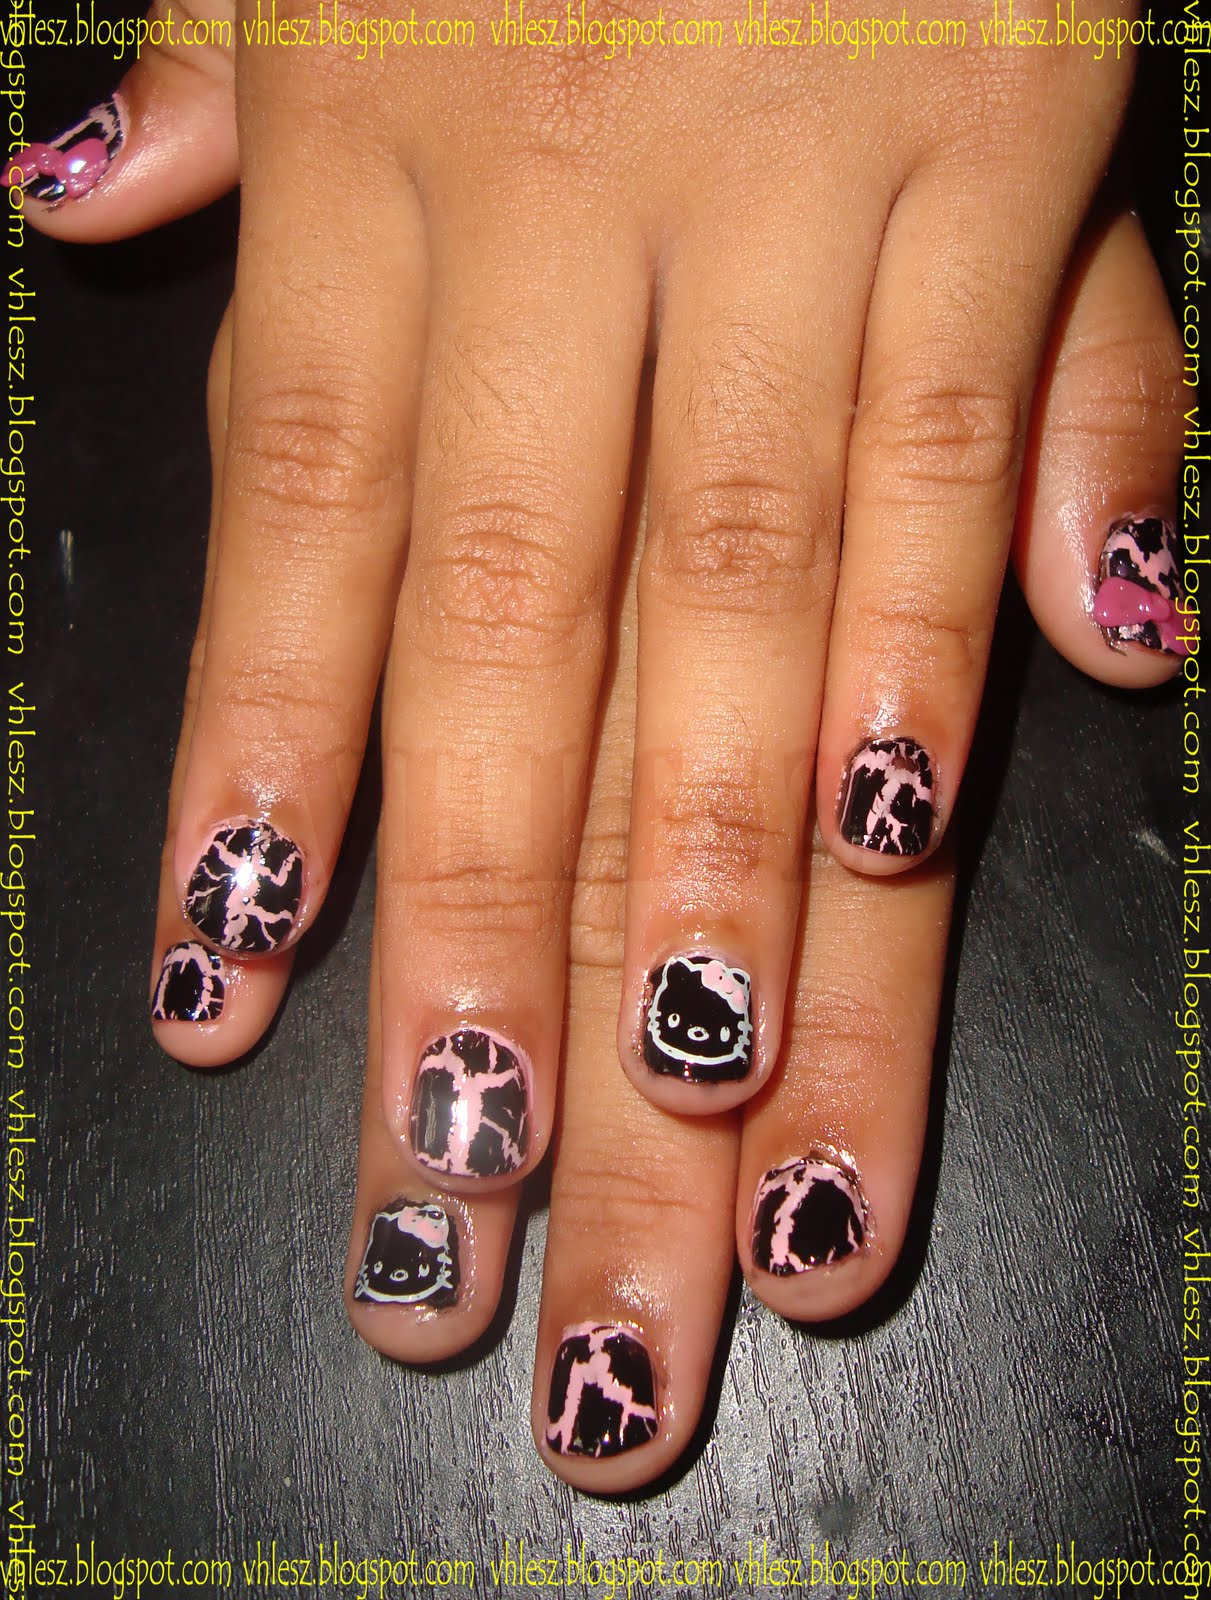 Minnie mouse nail art design